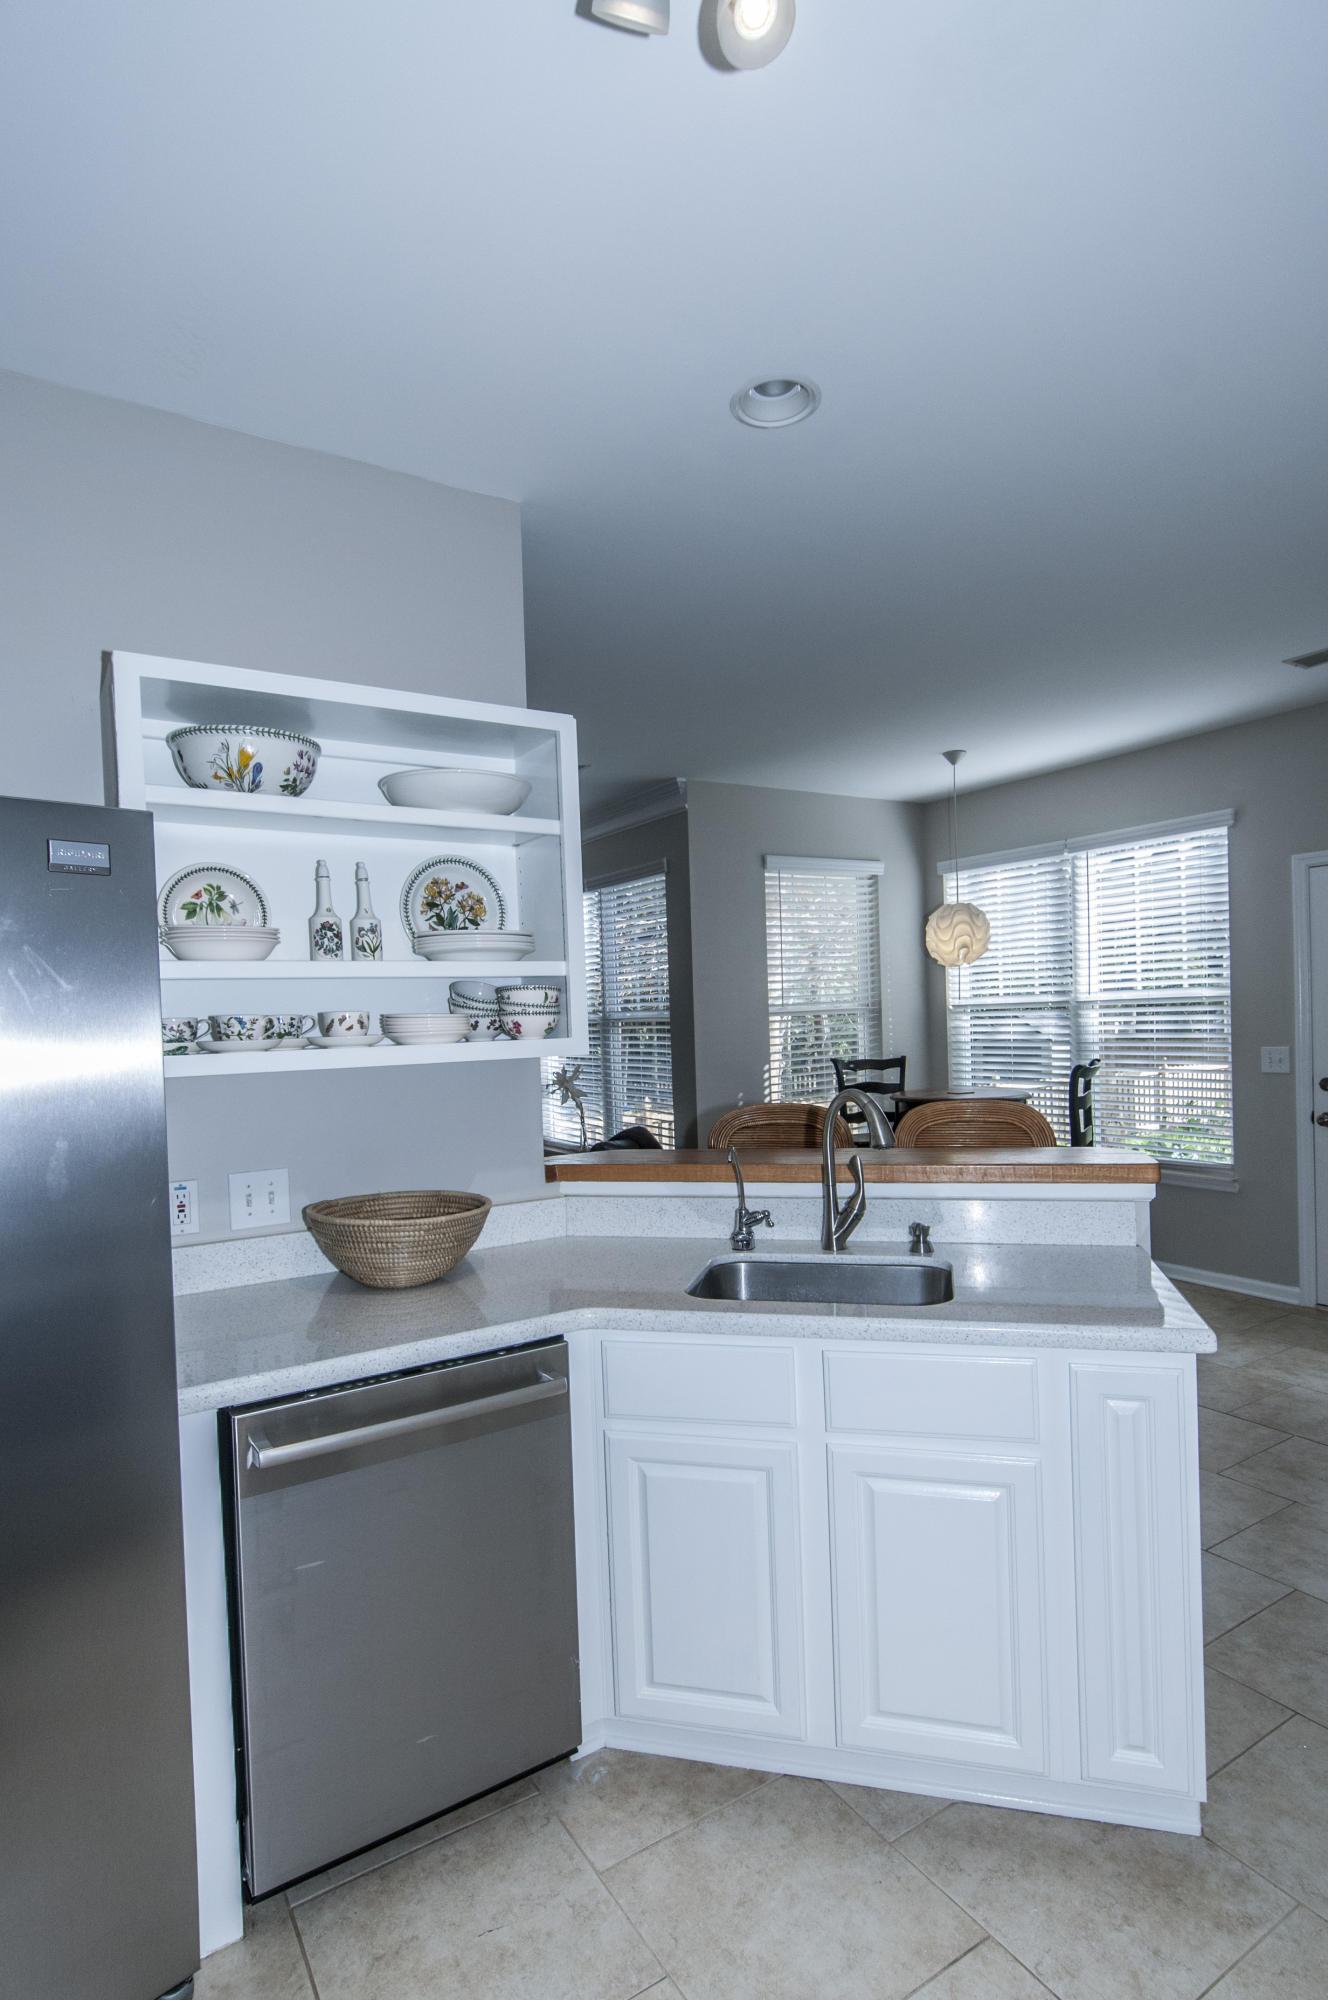 Etiwan Park Homes For Sale - 115 Brady, Daniel Island, SC - 40